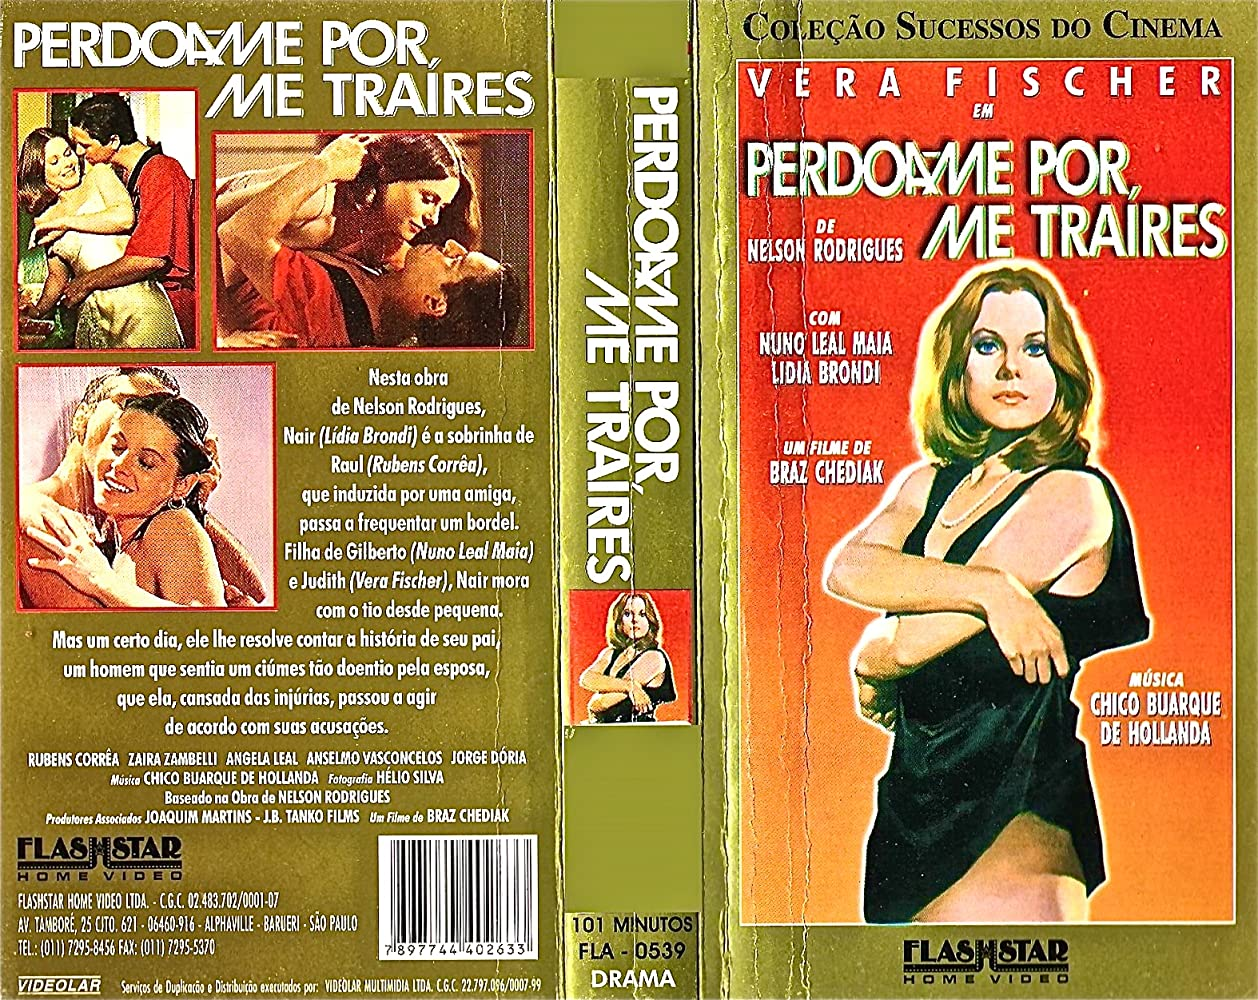 Perdoa-me Por Me Traíres (1980)